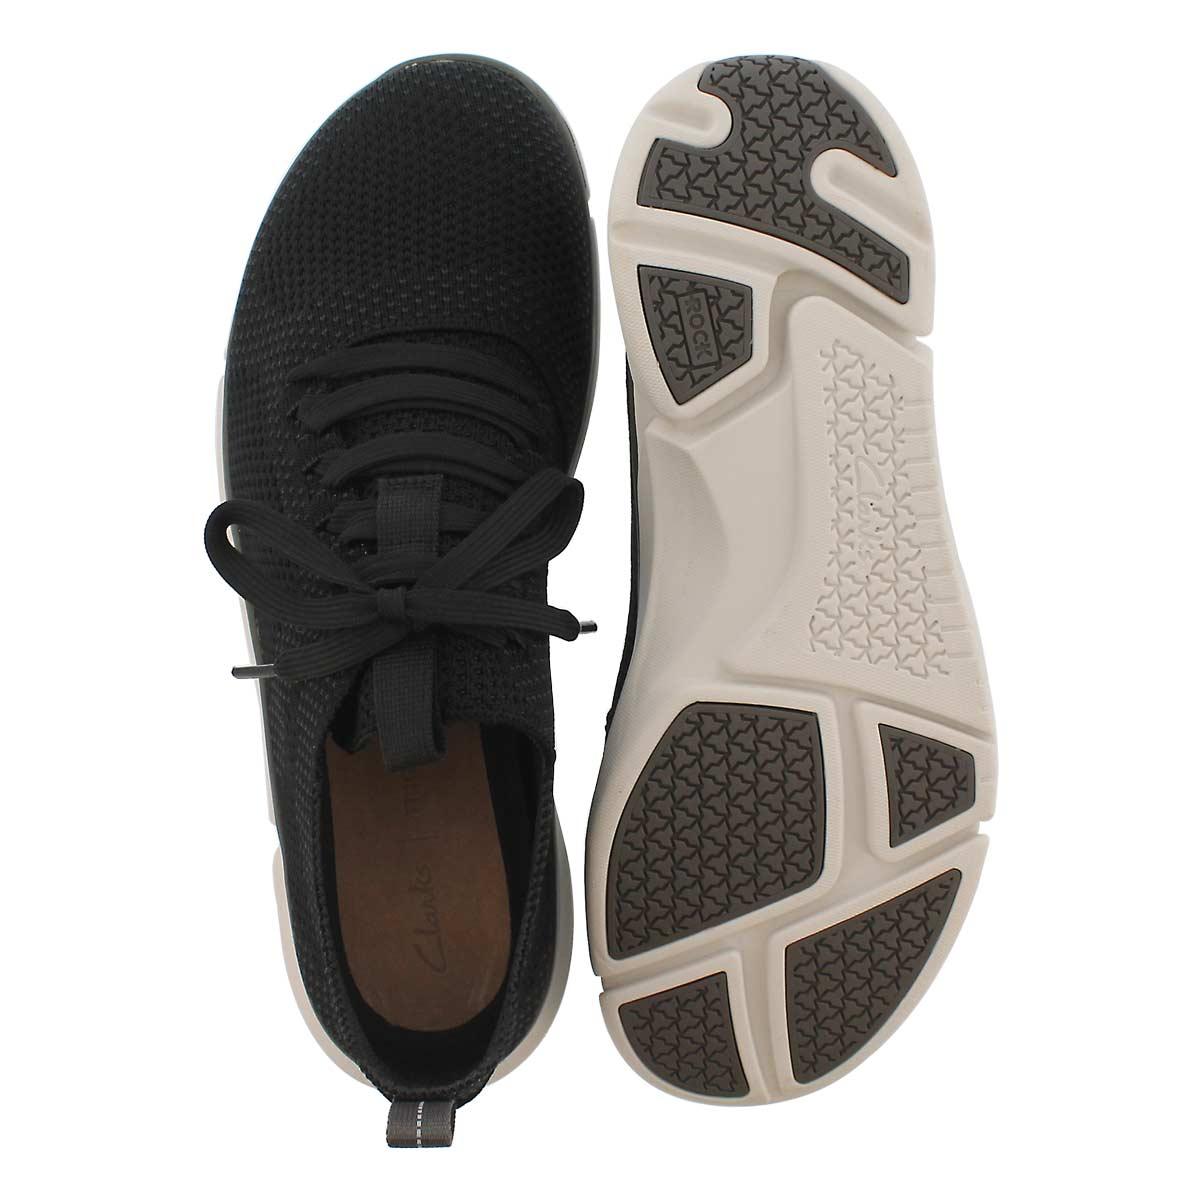 Mns Triken Run black lace up sneaker